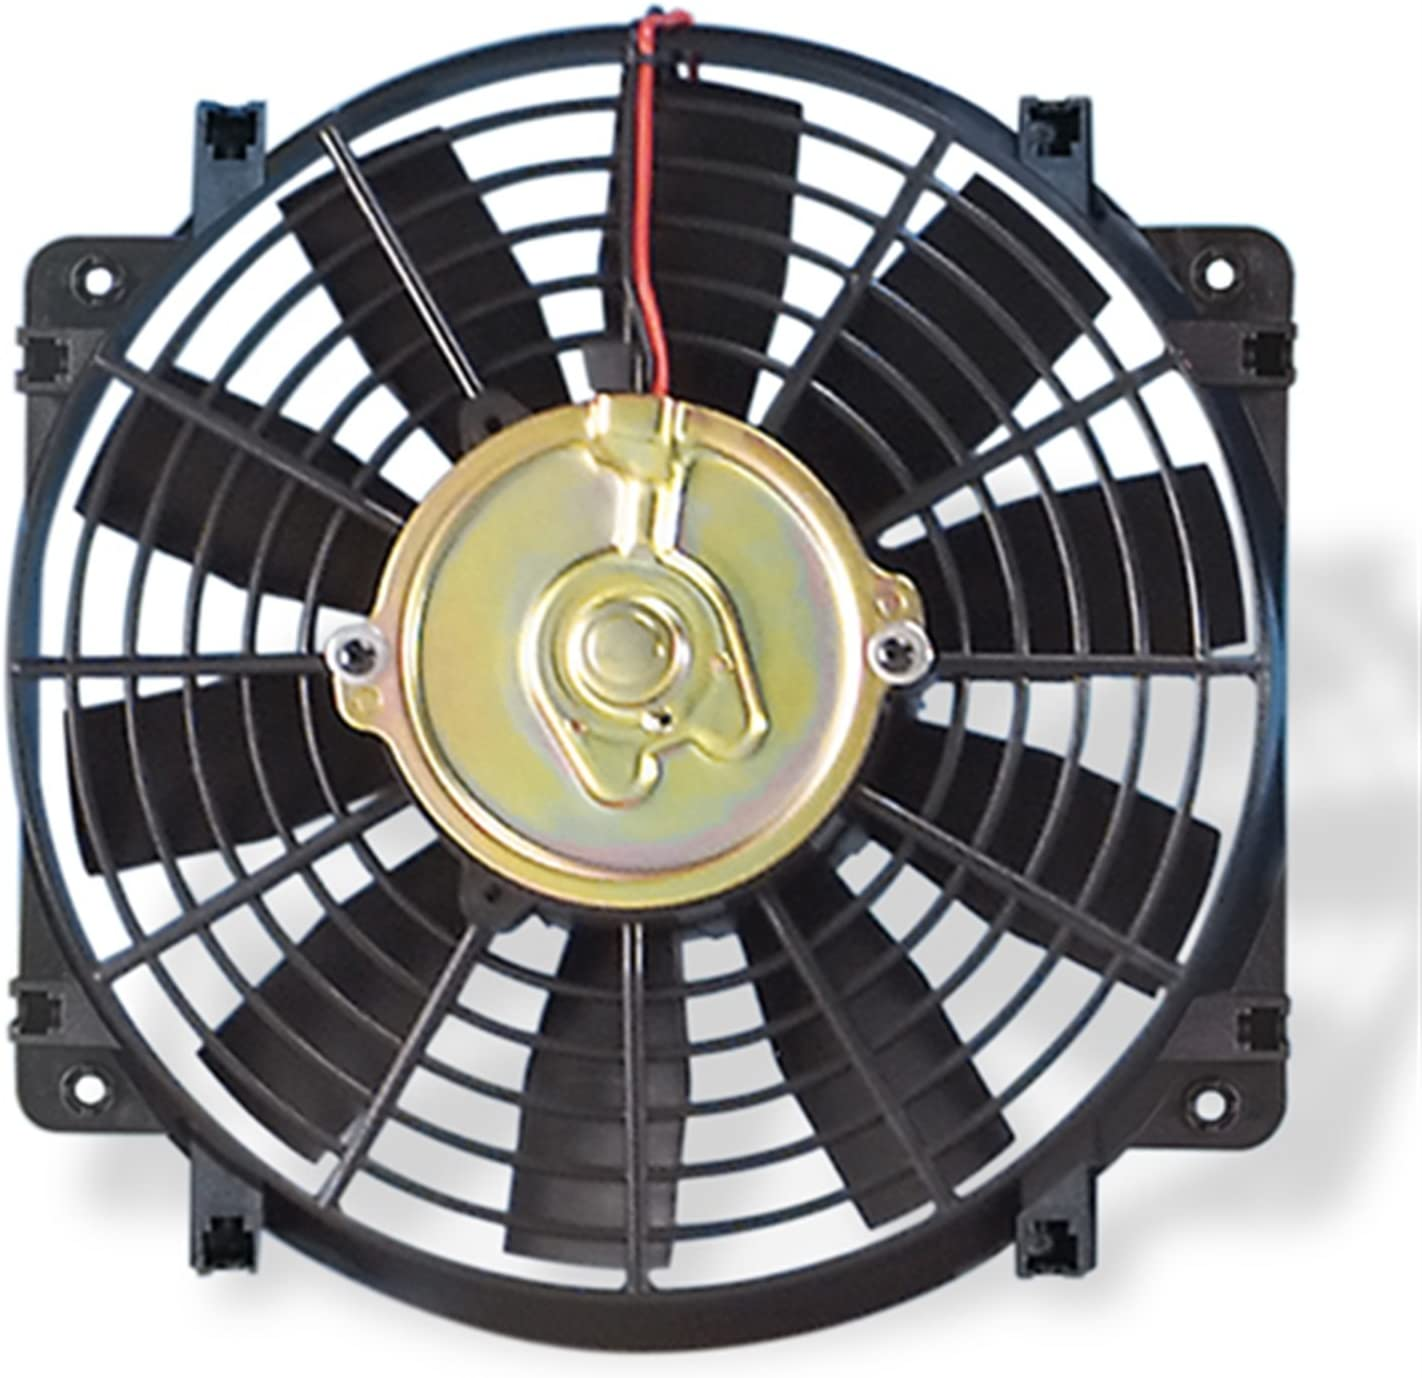 Flex-a-lite 108 Black 10 Trimline Electric Fan reversible